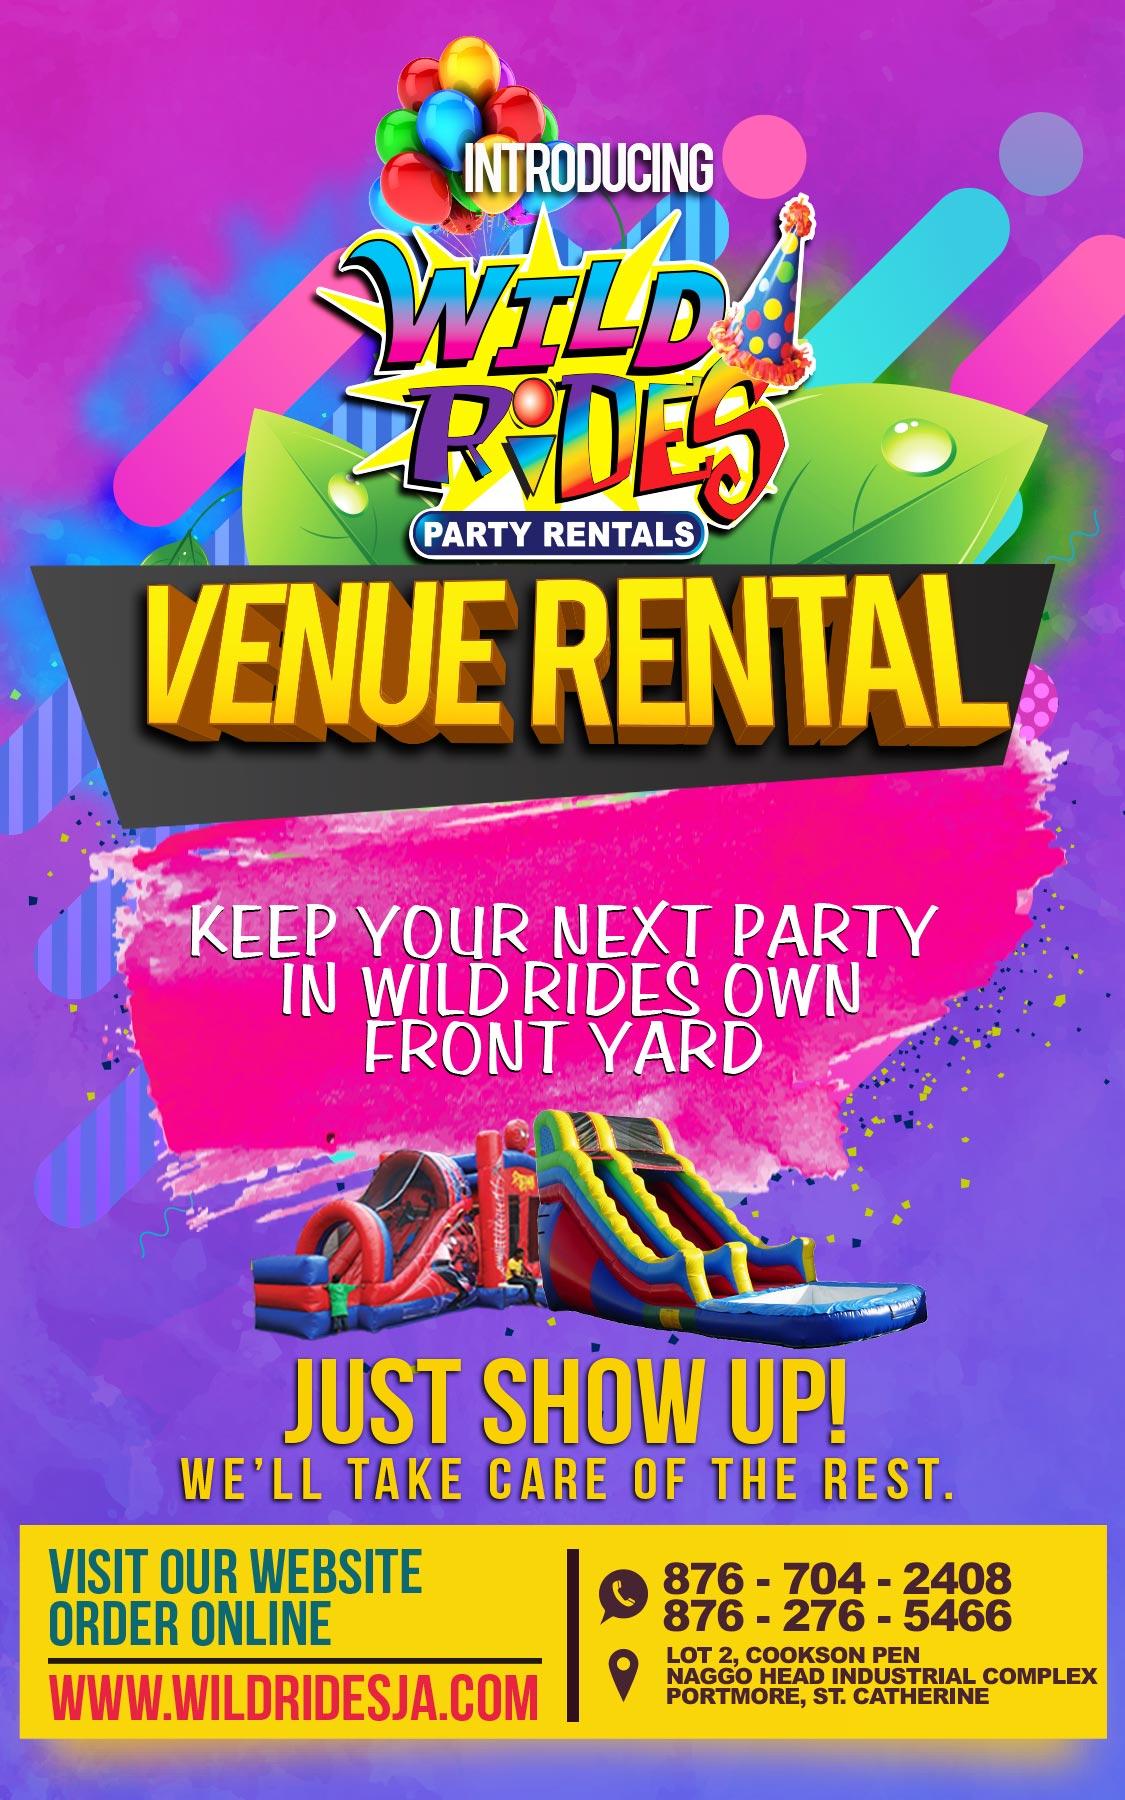 Wild Rides Party Rentals KidsZone Venue Rental